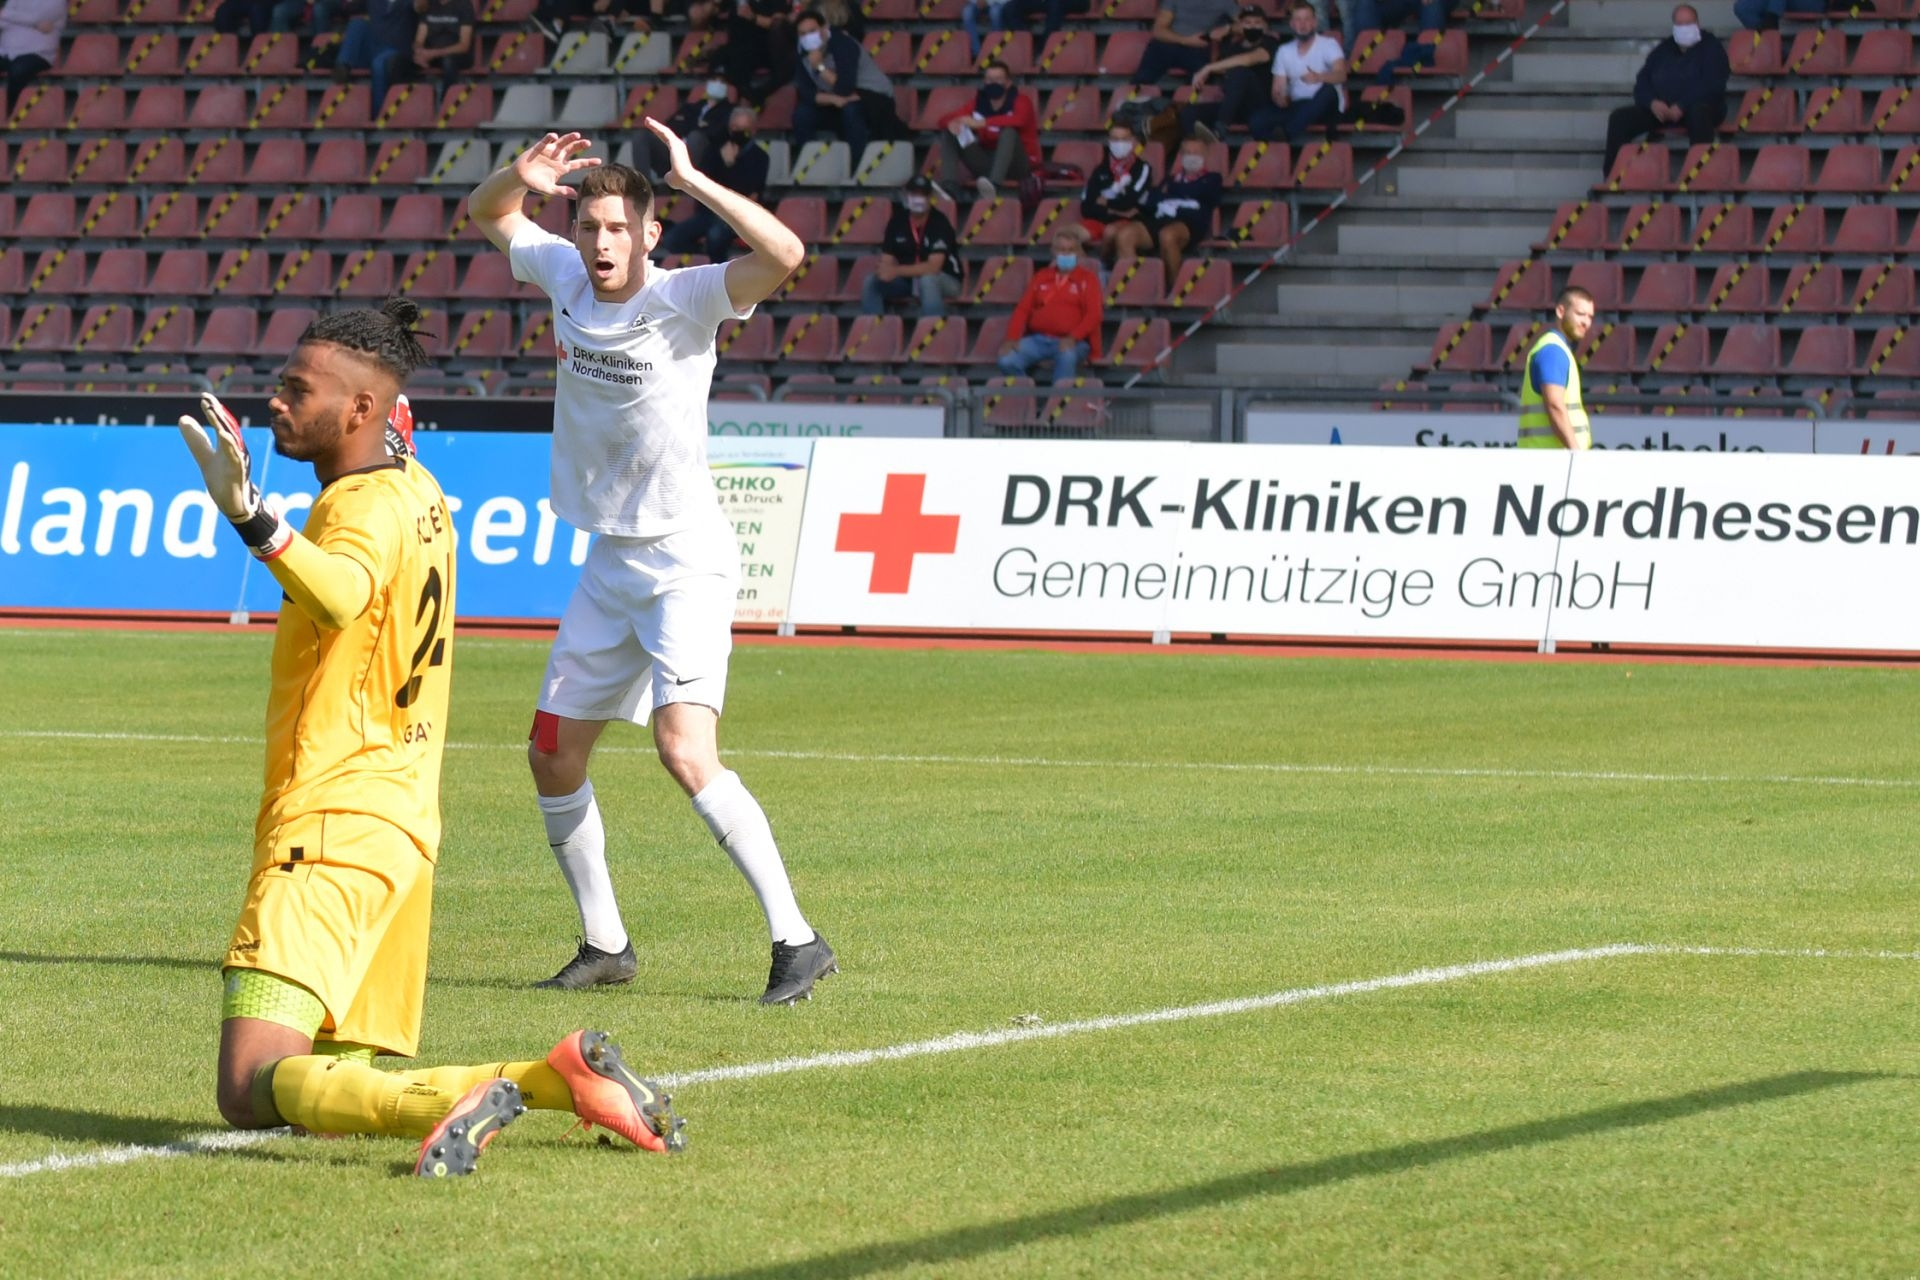 Regionalliga Südwest 2020/21, KSV Hessen Kassel, Rot-Weiss-Koblenz, Endstand 1:1, Iksal